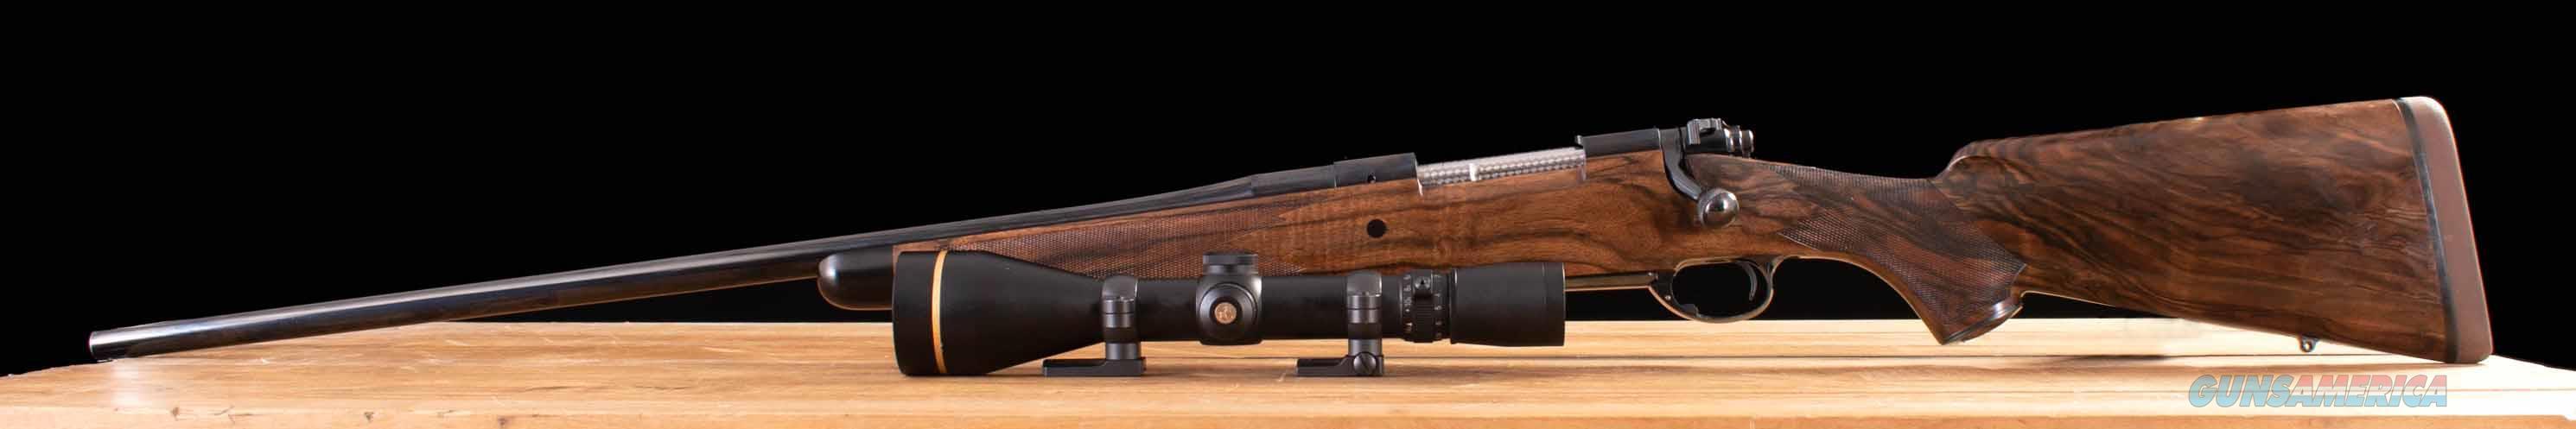 Sterling Davenport Model 70 .300 REM ULTRA MAG, LEFT HAND, vintage firearms inc  Guns > Rifles > Custom Rifles > Bolt Action